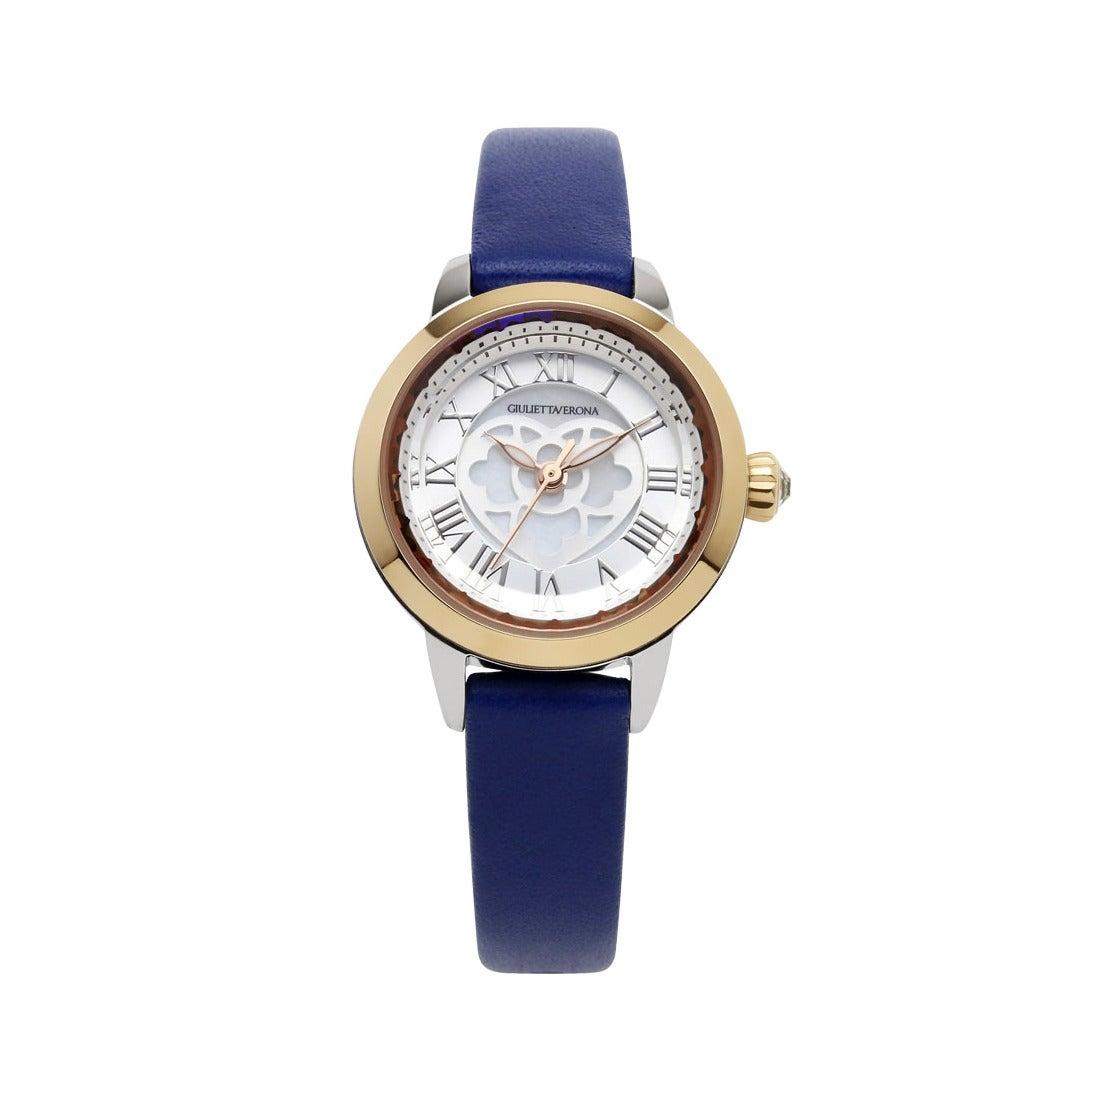 【SAC'S BAR】ジュリエッタヴェローナ GIULIETTAVERONA 腕時計 GV003TS LOVE VERONA シルバー×ネイビー